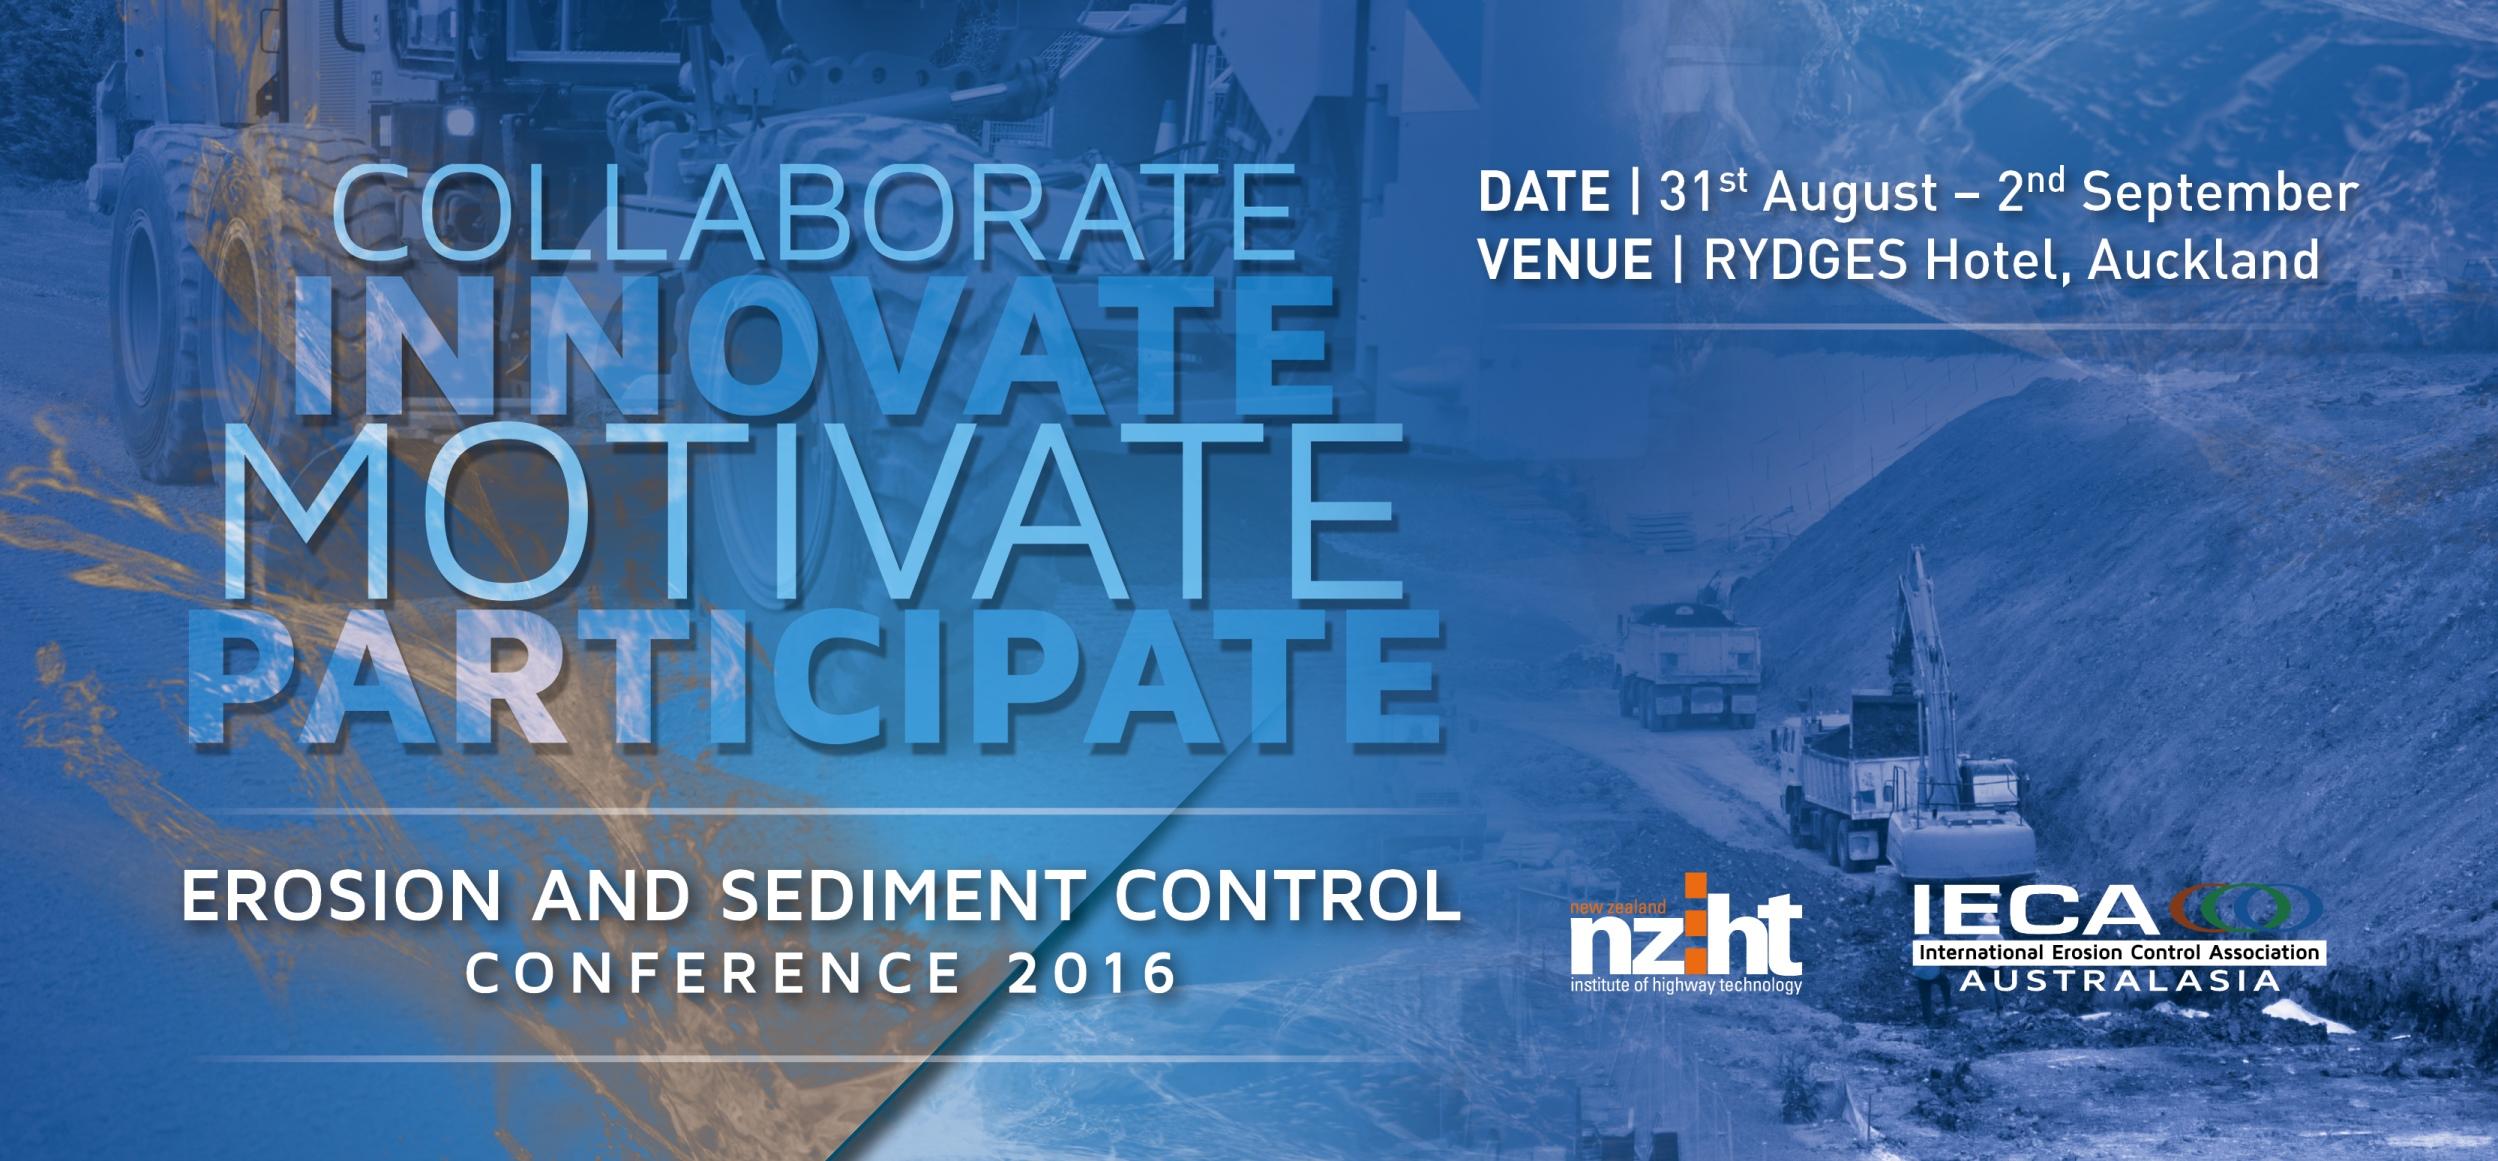 IECA & NZIHT Erosion and Sediment Control Conference logo